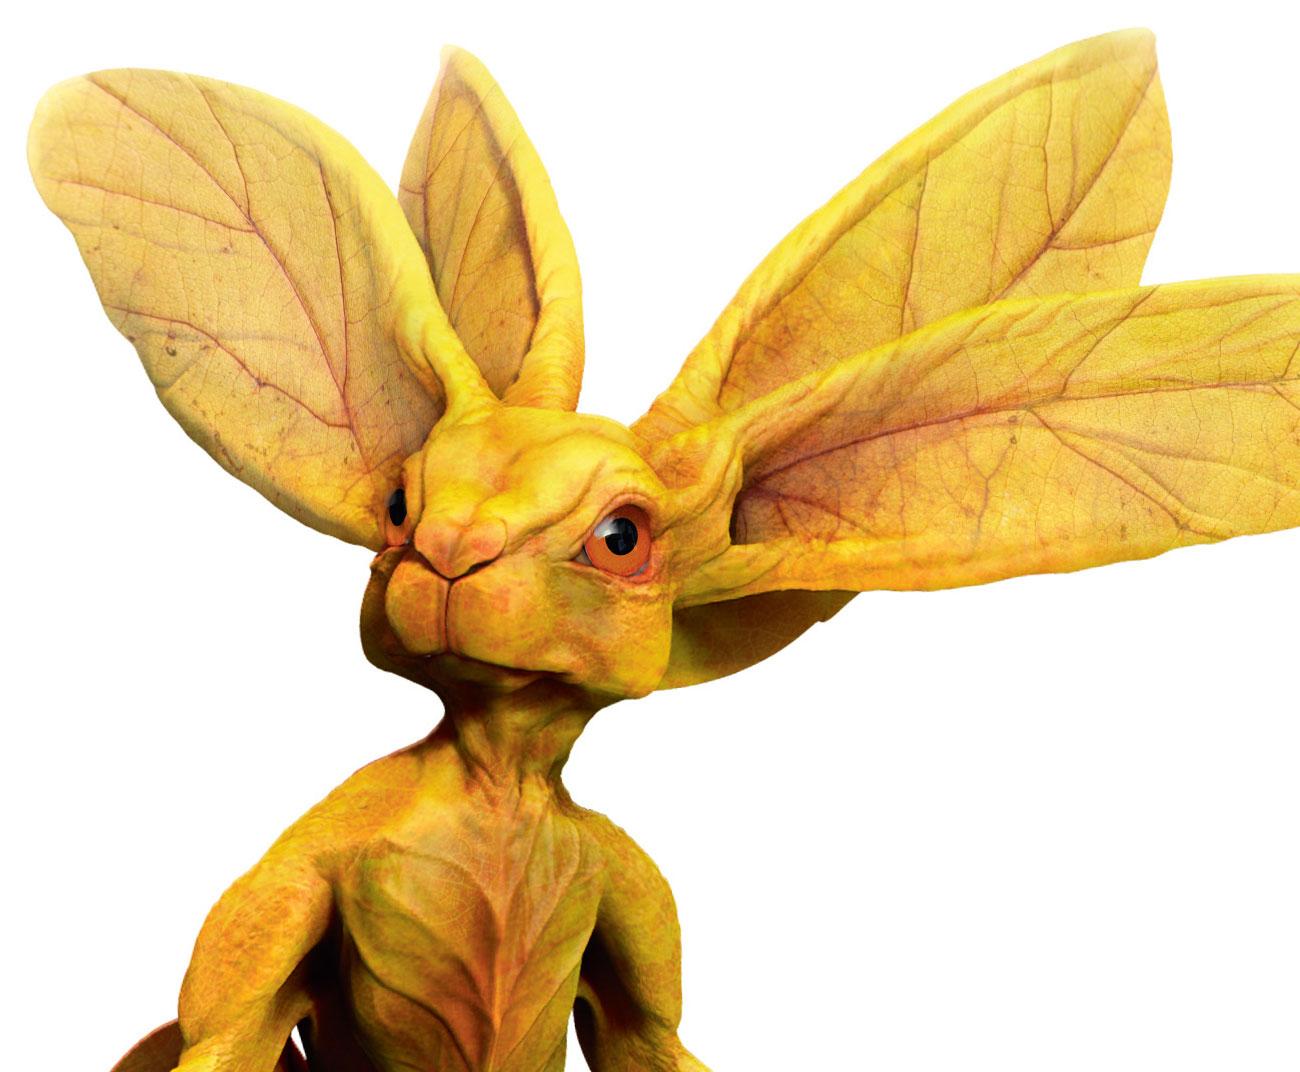 Speed sculpt a creature in ZBrush - Ειδήσεις από τον χώρο